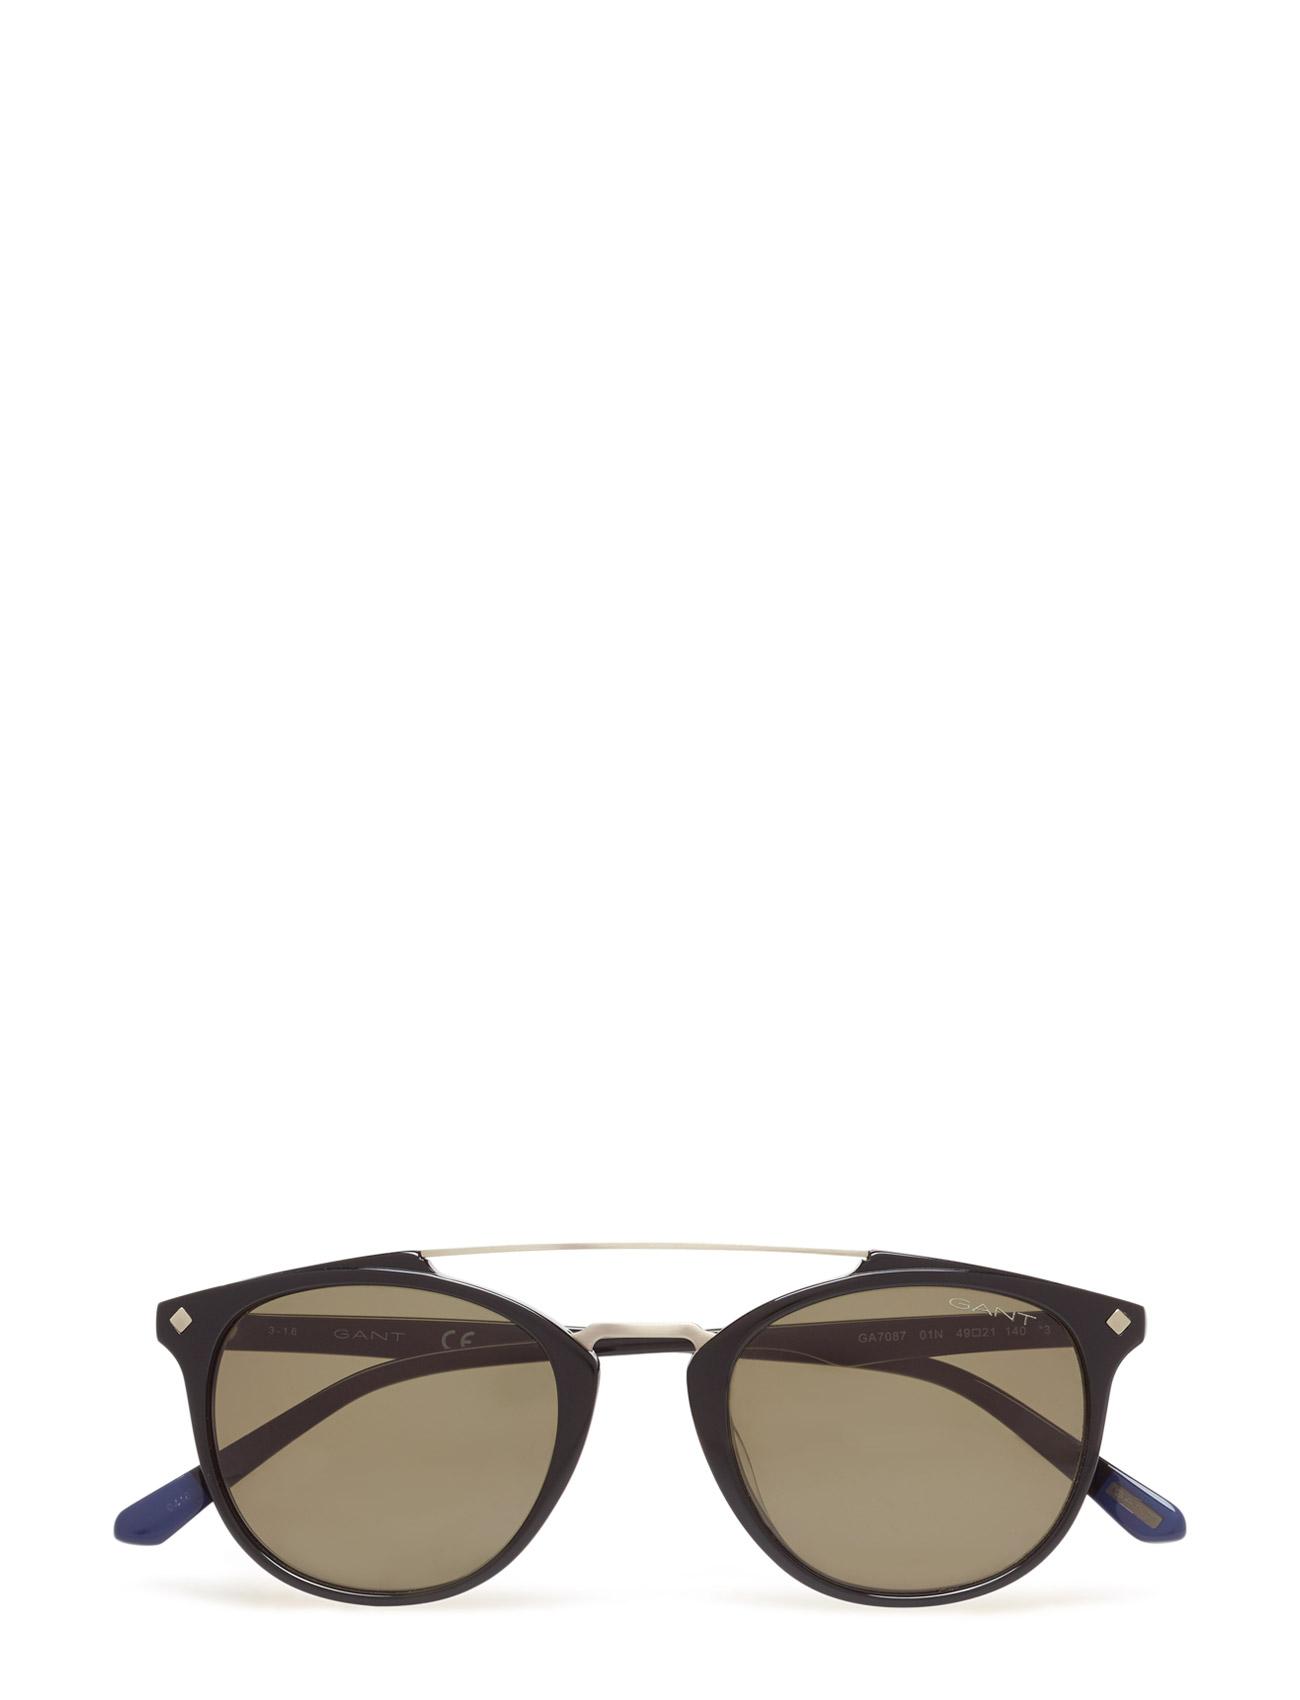 cad174eb02 Gant Sunglasses Men Ga7087 (01n Shiny Black   Green)